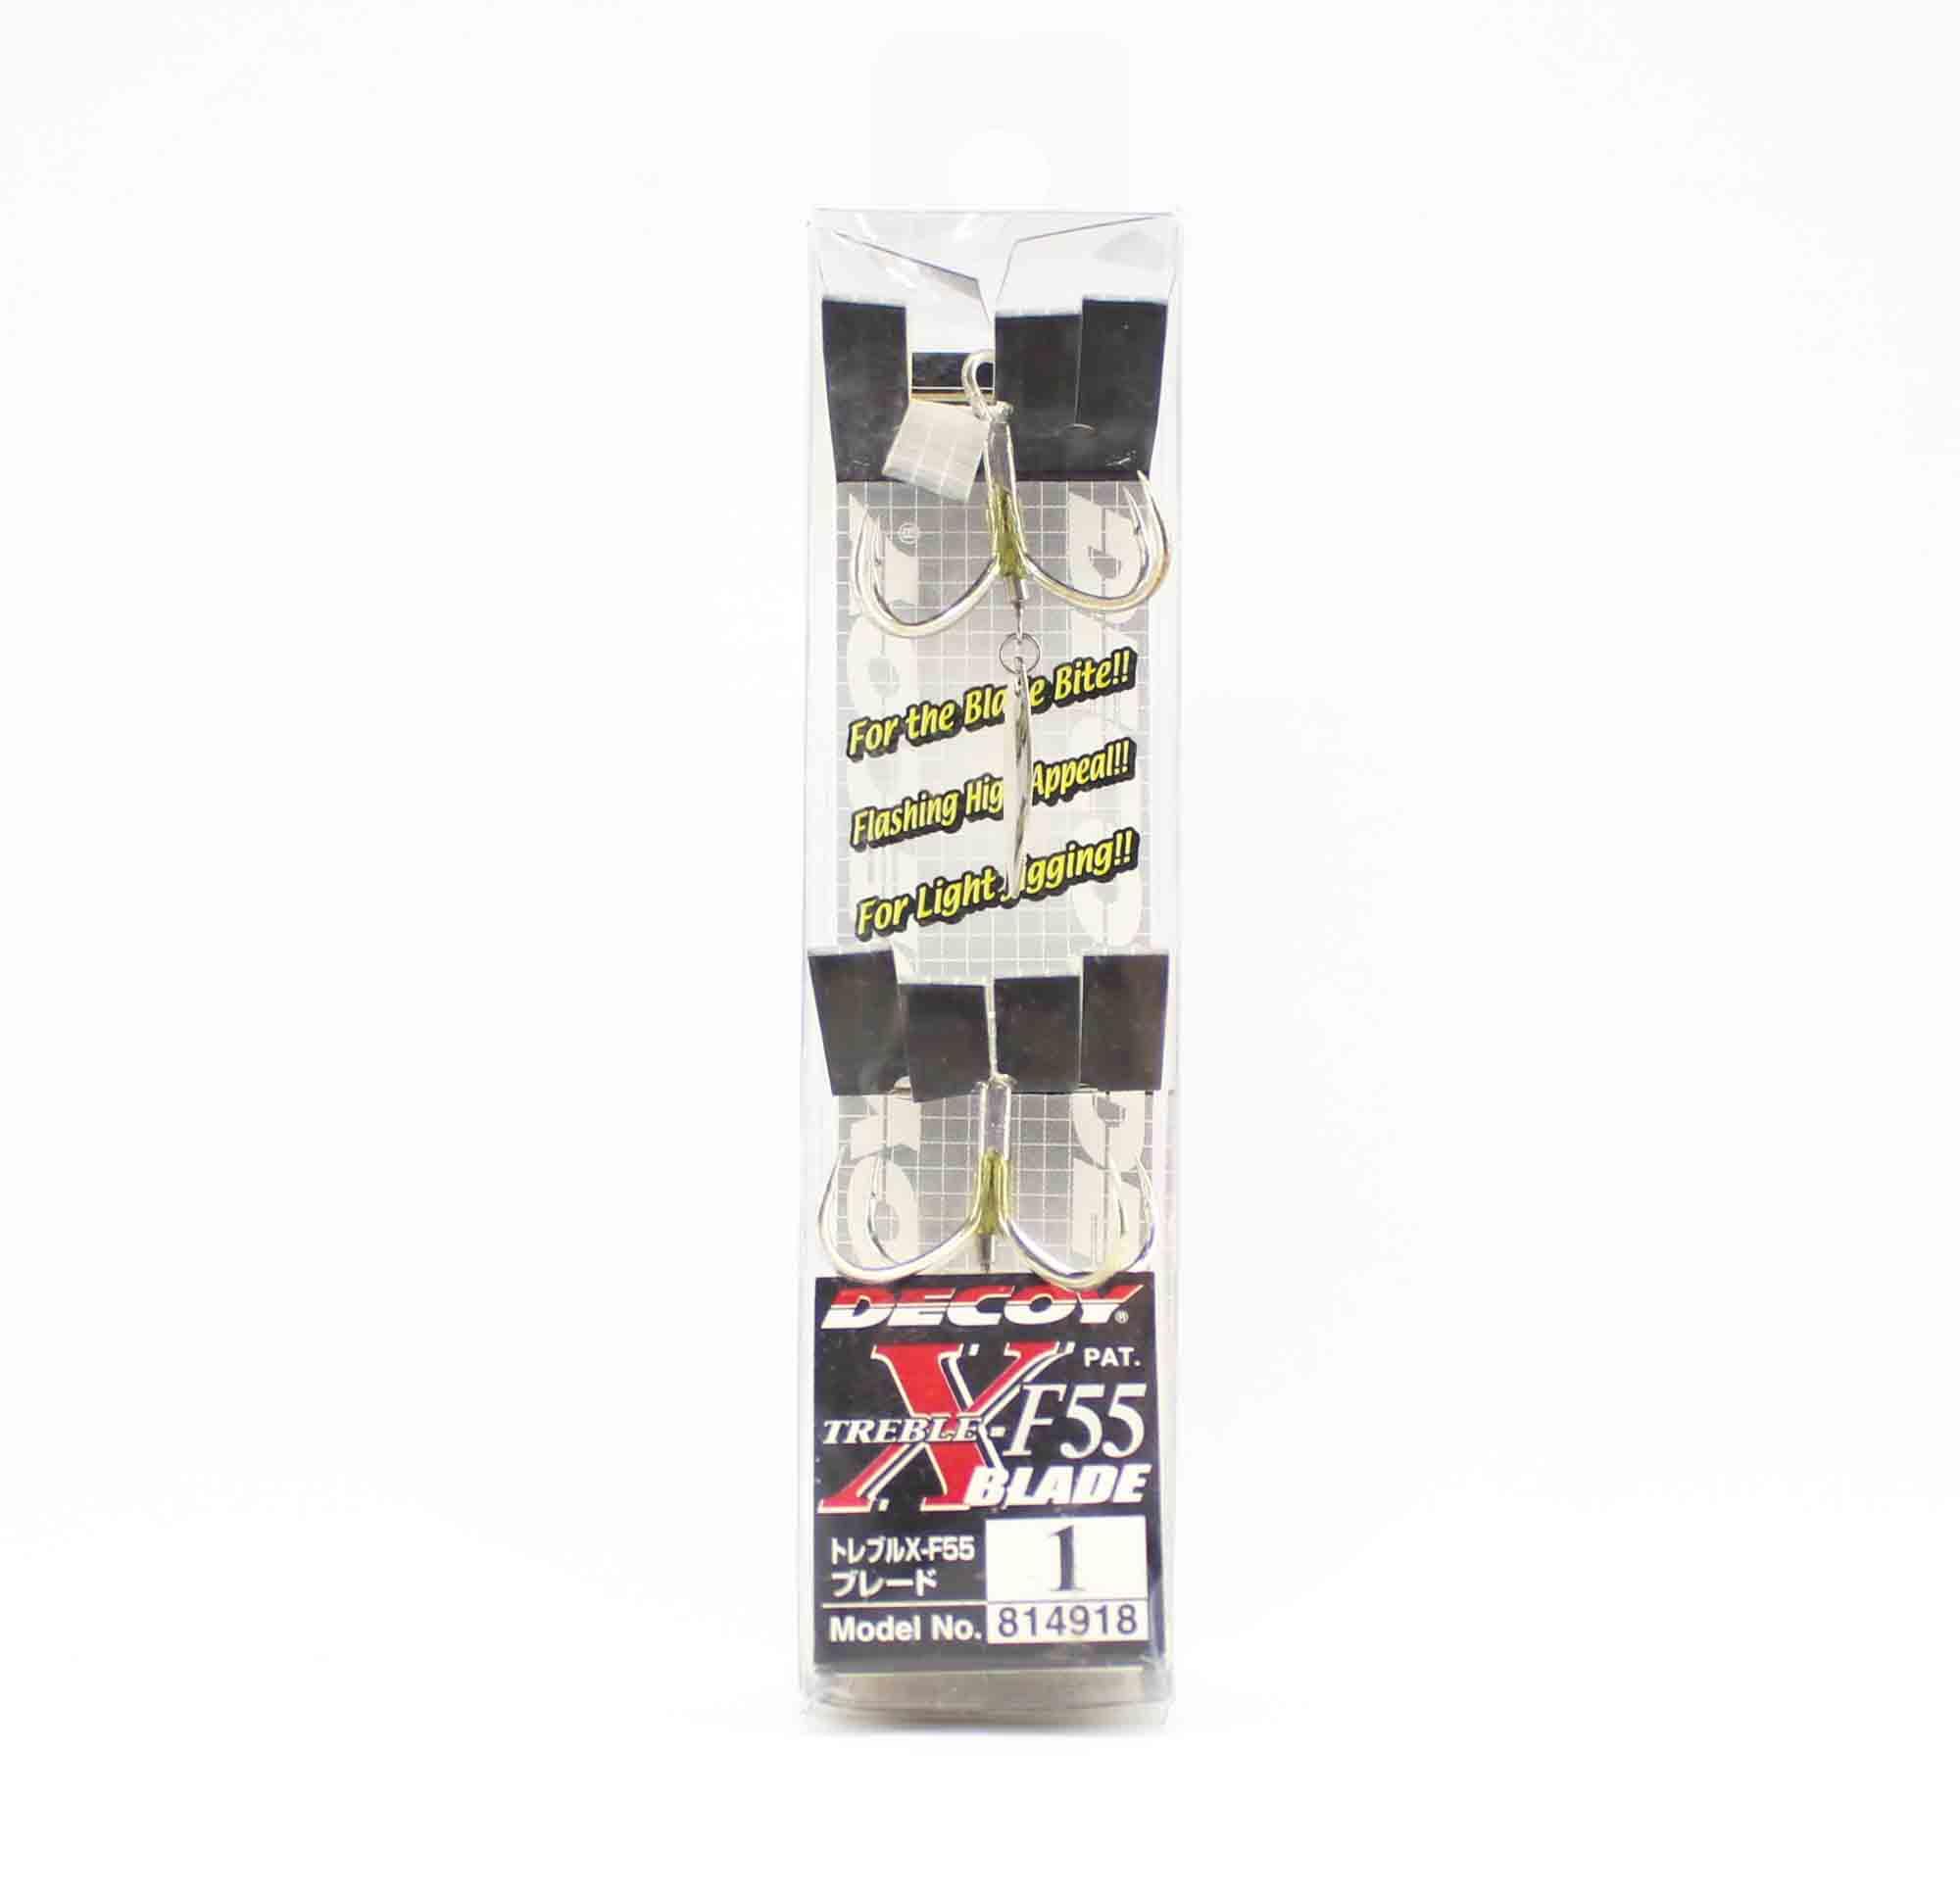 Decoy X-F55 Treble Hook Quattro Wide Angle Hooks Size 1 (4918)